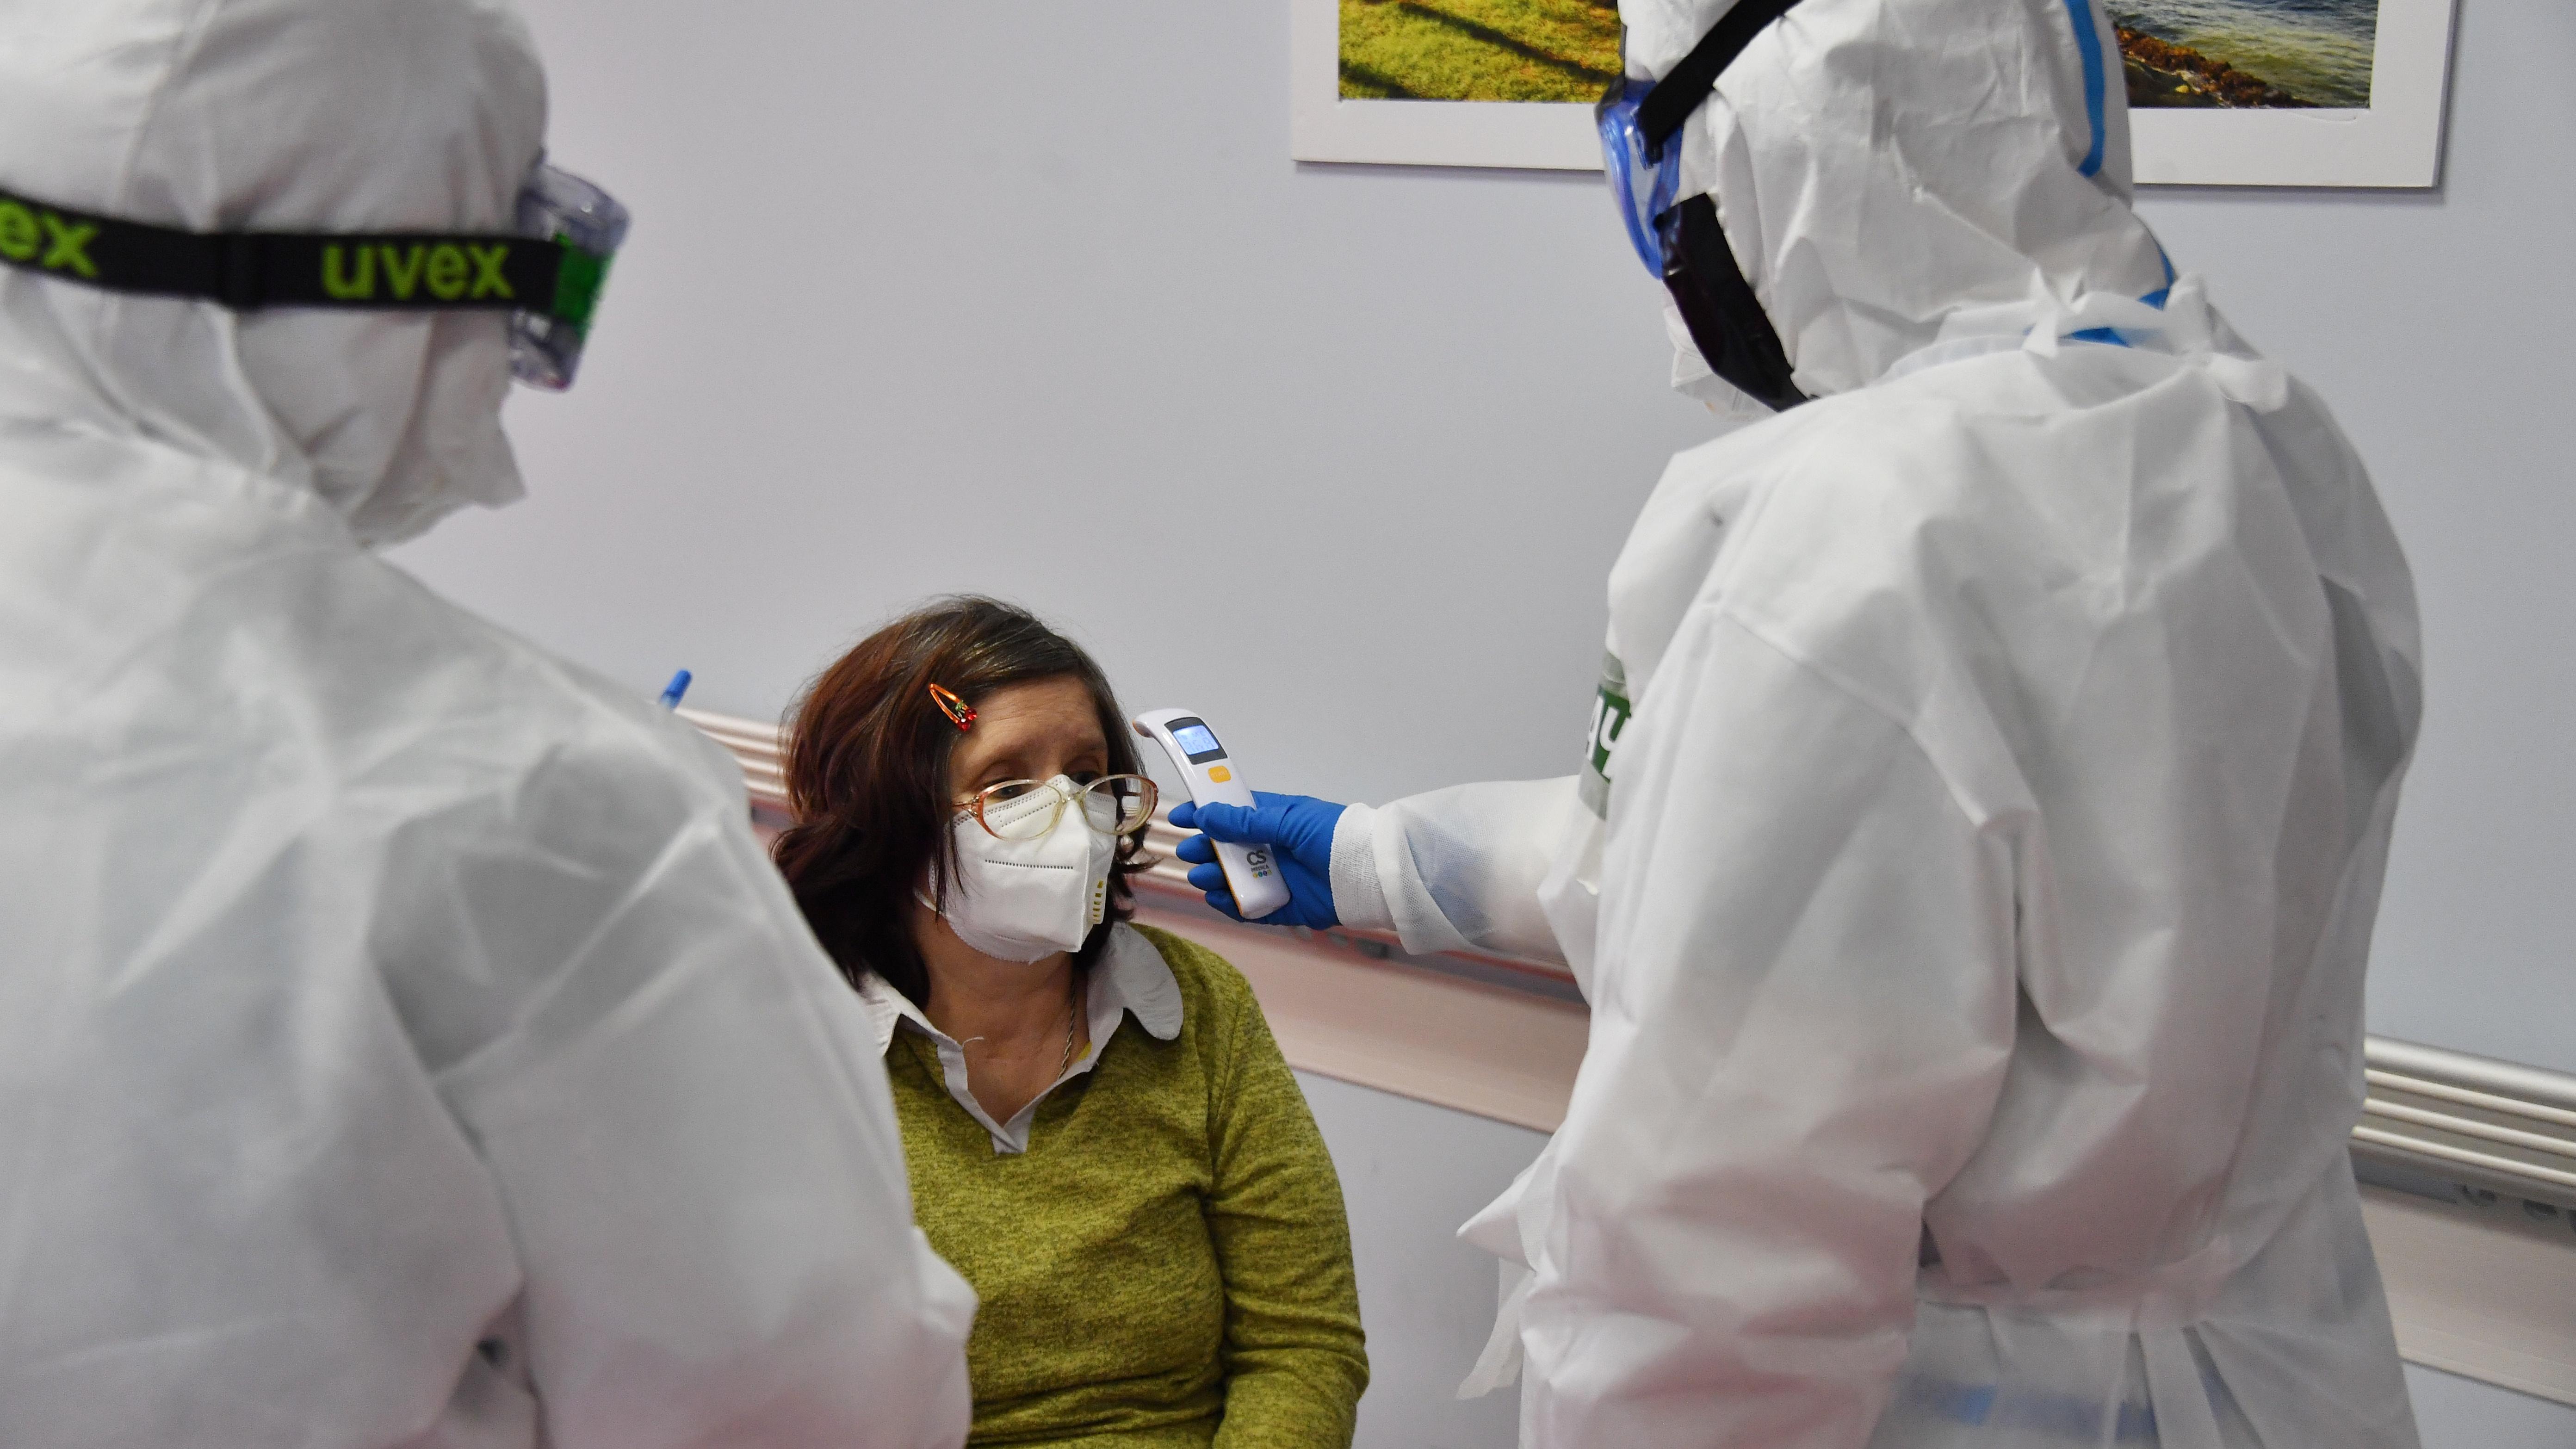 За борьбу с коронавирусом пяти российским врачам присвоено звание Героя Труда